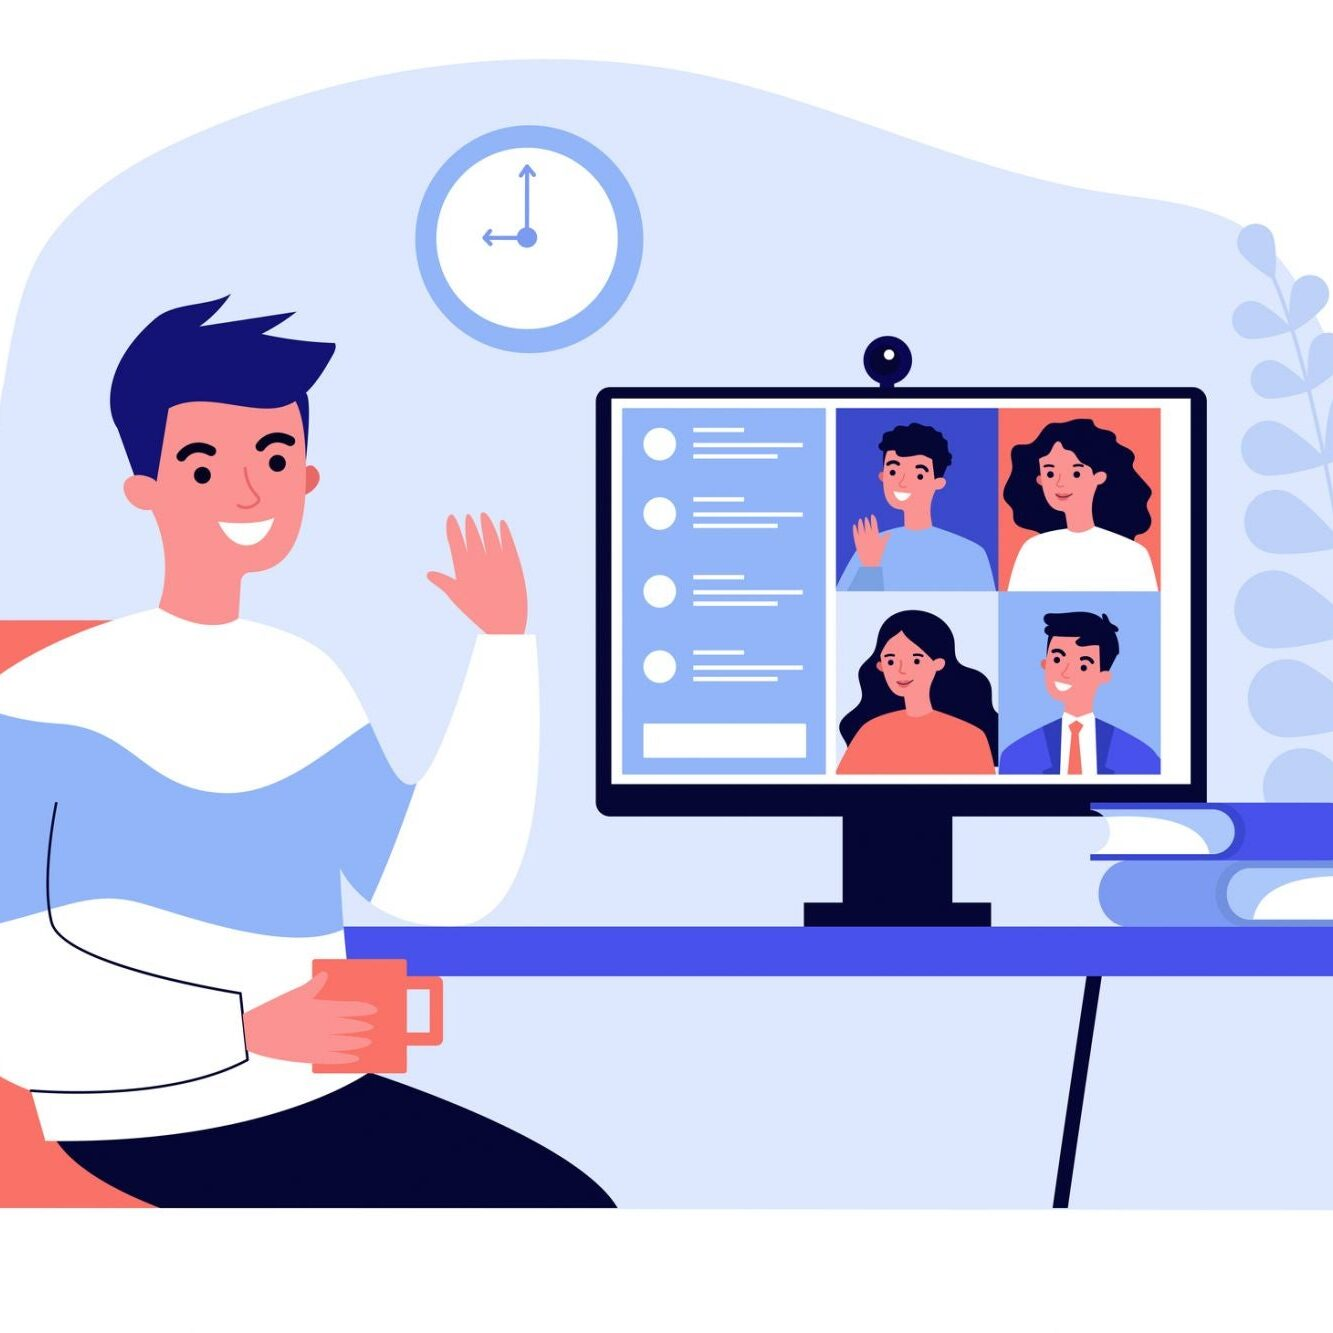 Animation of man on computer